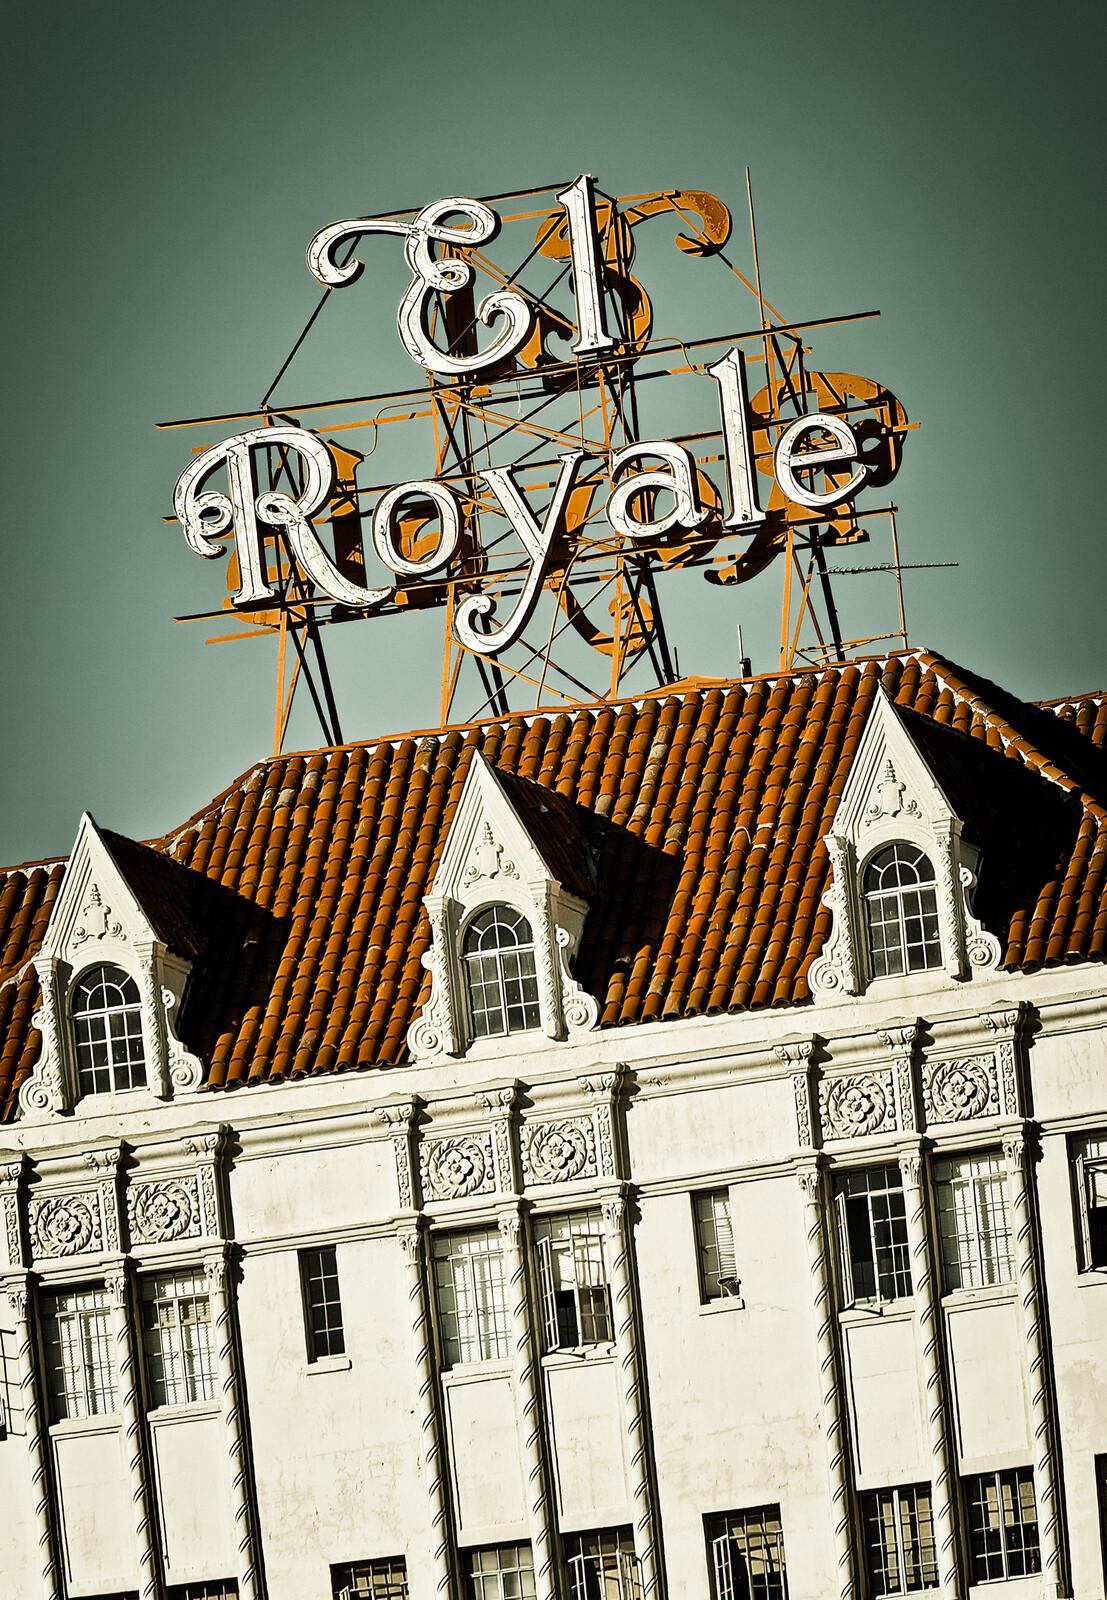 El Royale Apartments - Marc Shur